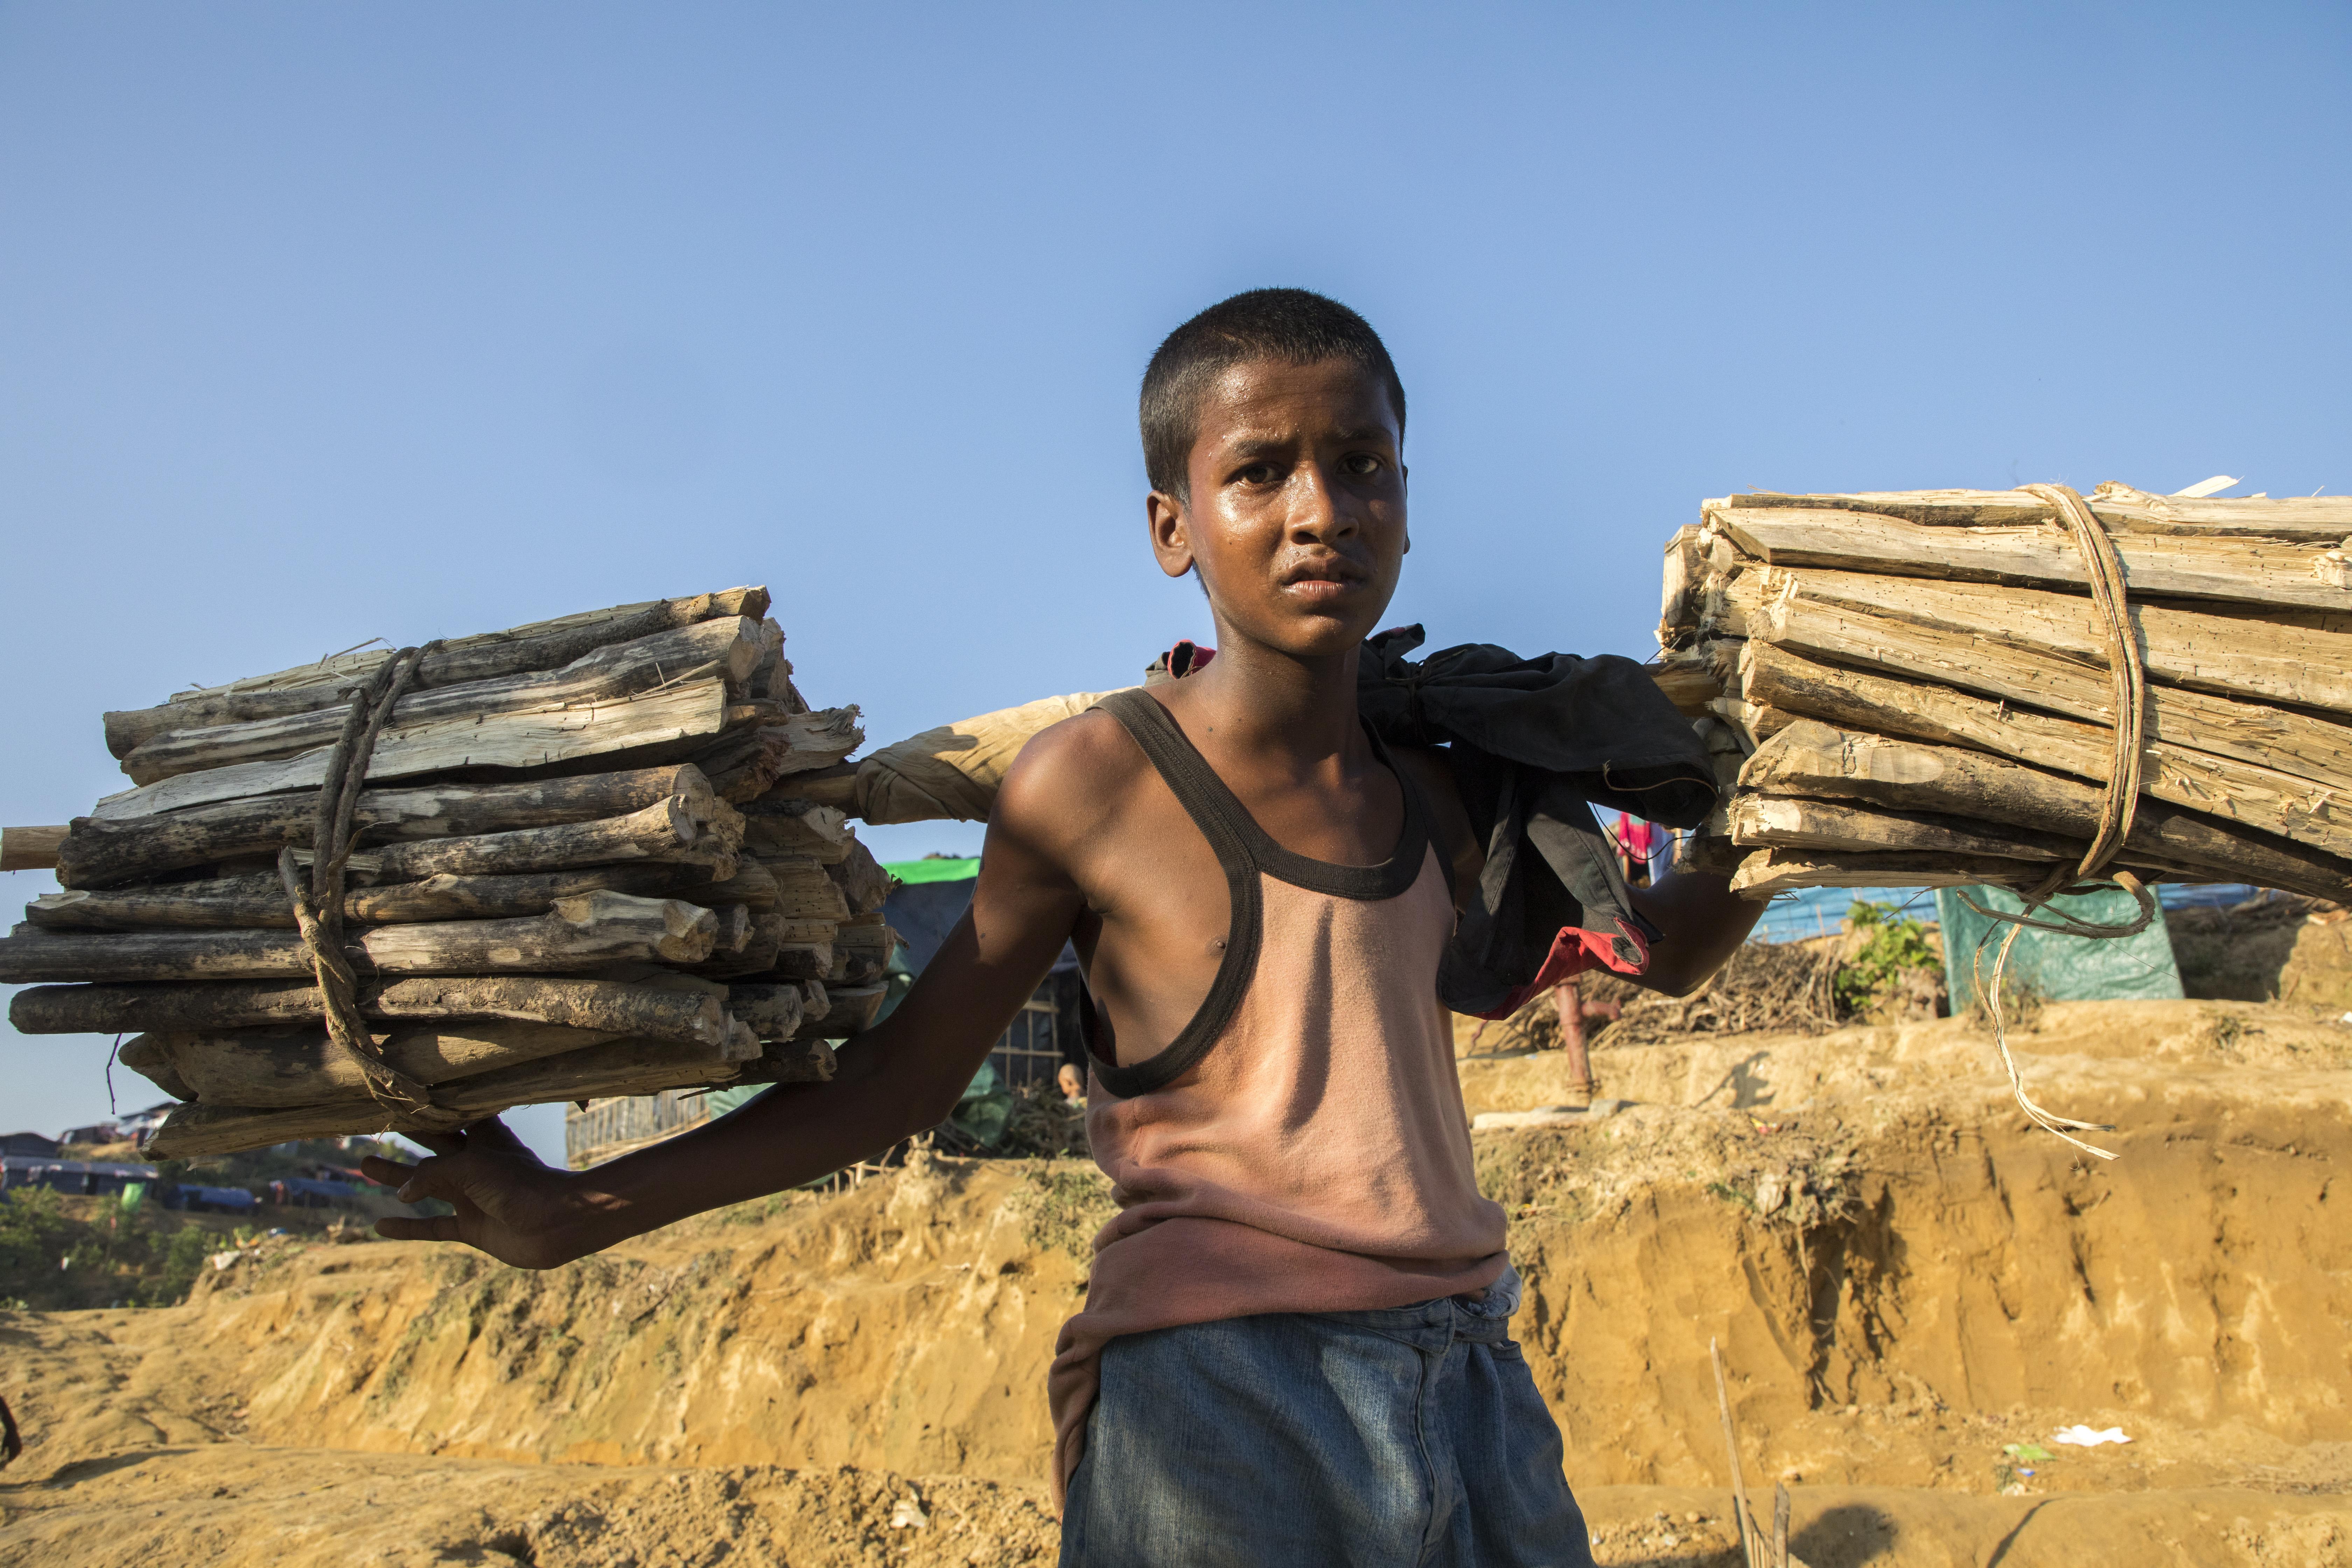 Image depicting Rebuilding lives in Bangladesh